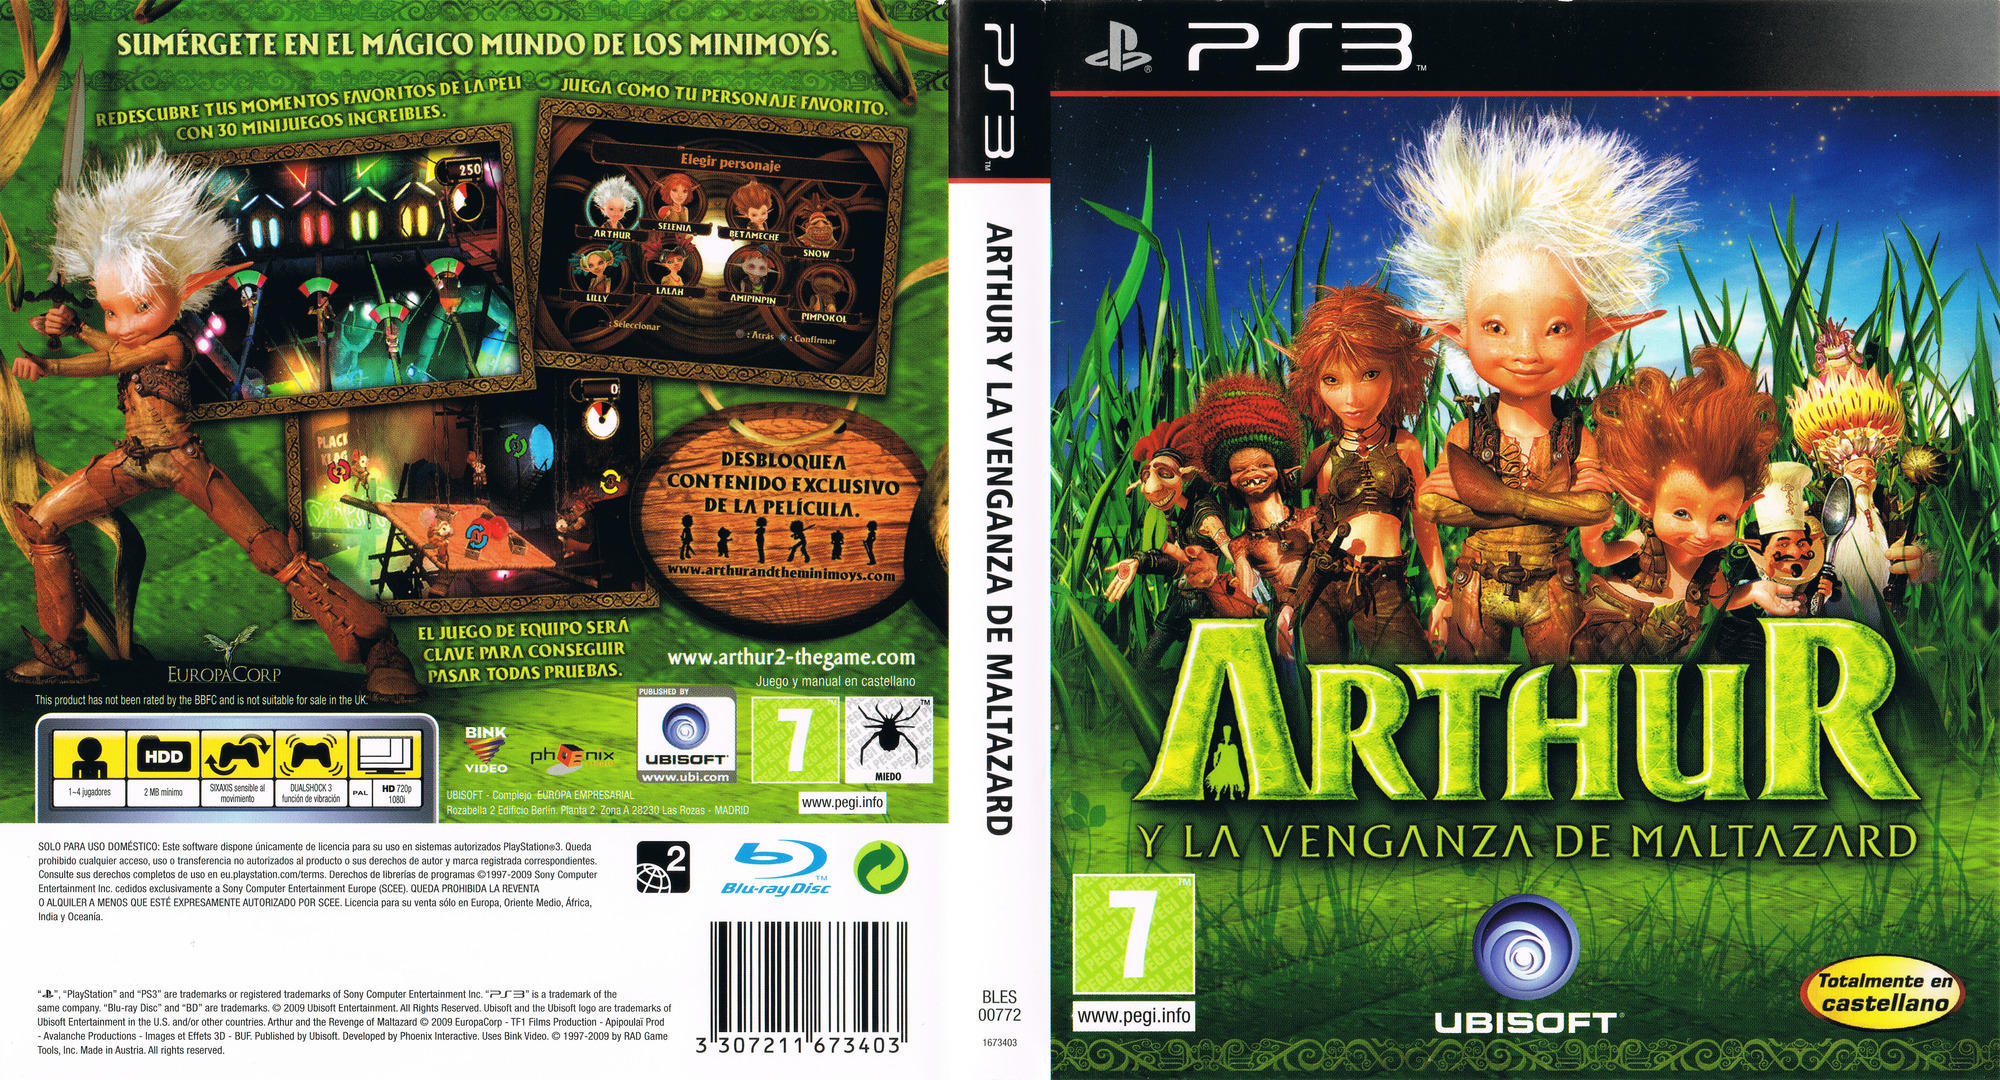 Arthur y la Venganza de Maltazard PS3 coverfullHQ (BLES00772)